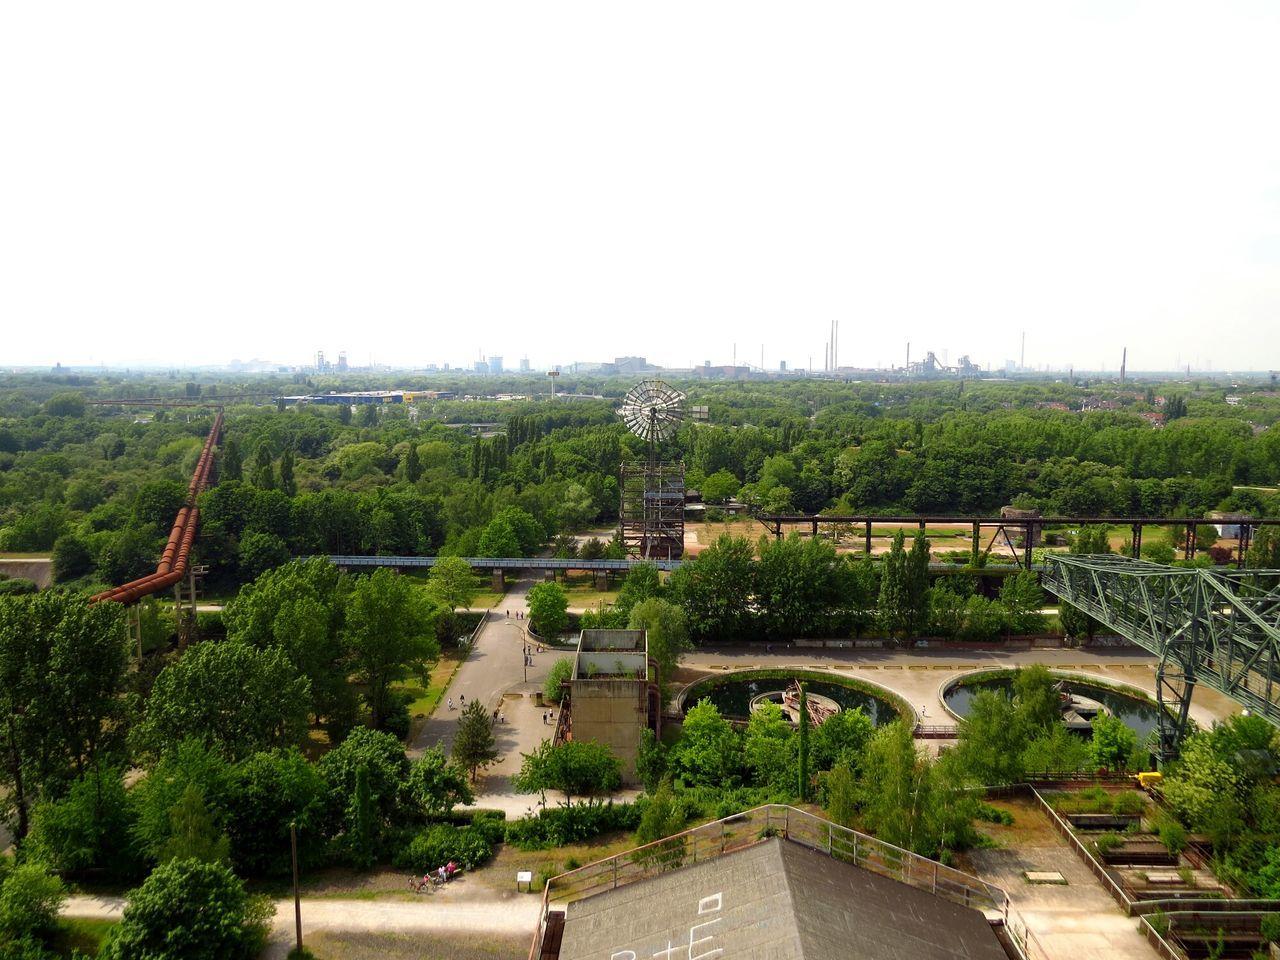 Cityscapes Landschaftspark | Duisburg | Germany Duisburg Landscapes